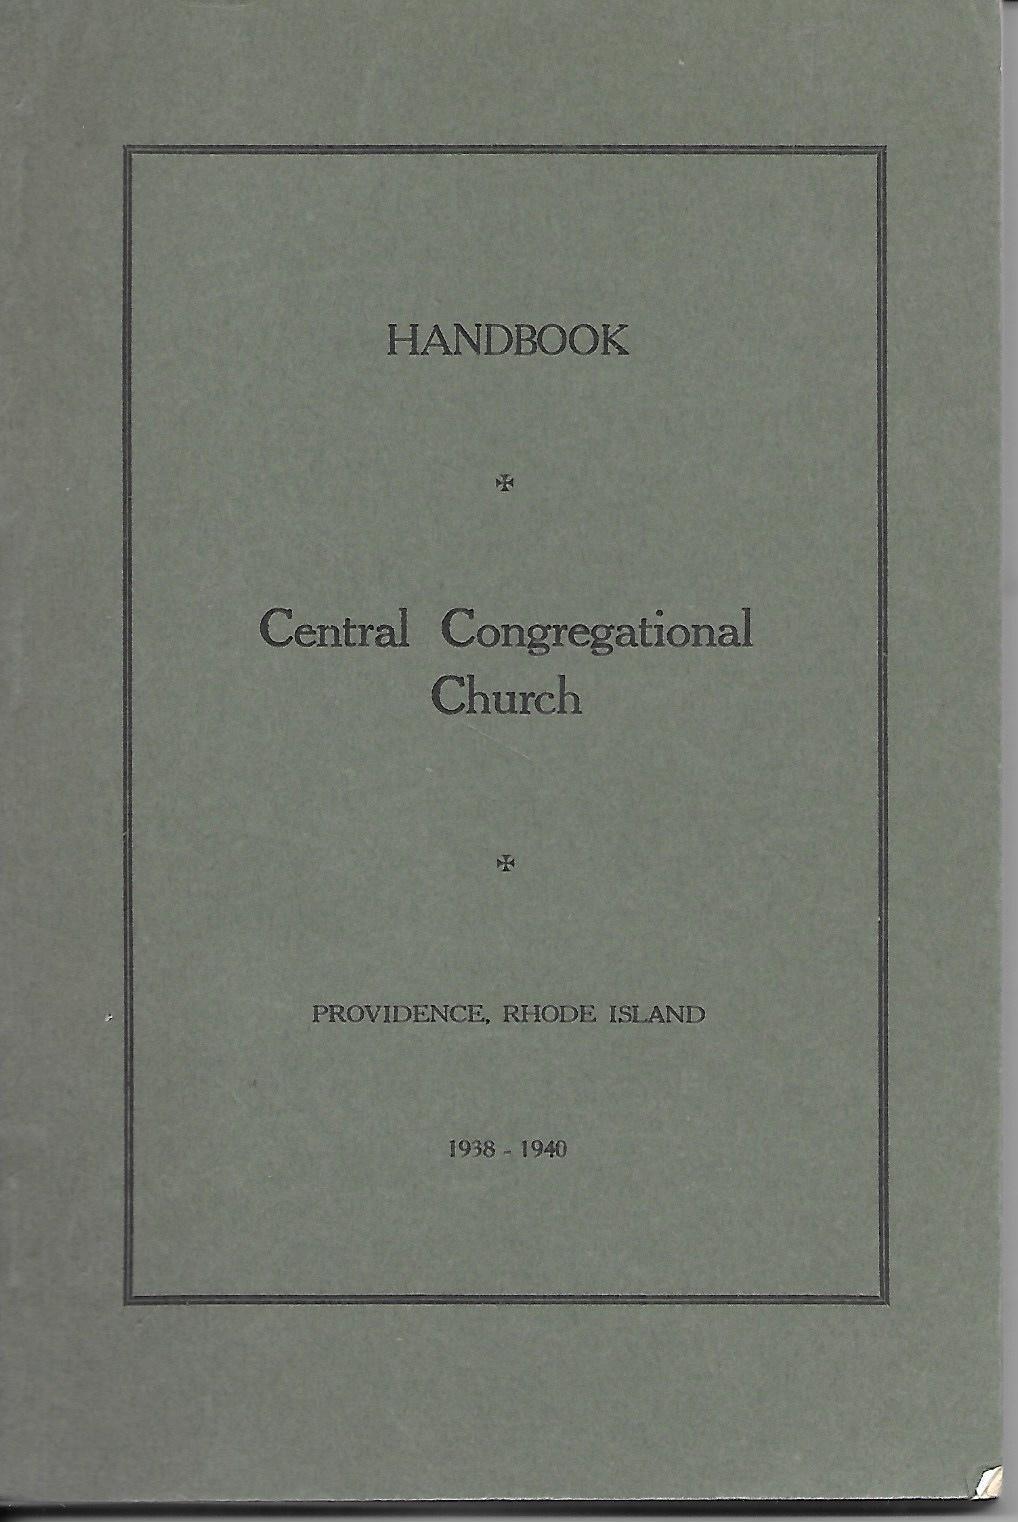 Image for Central Congregational Church Handbook